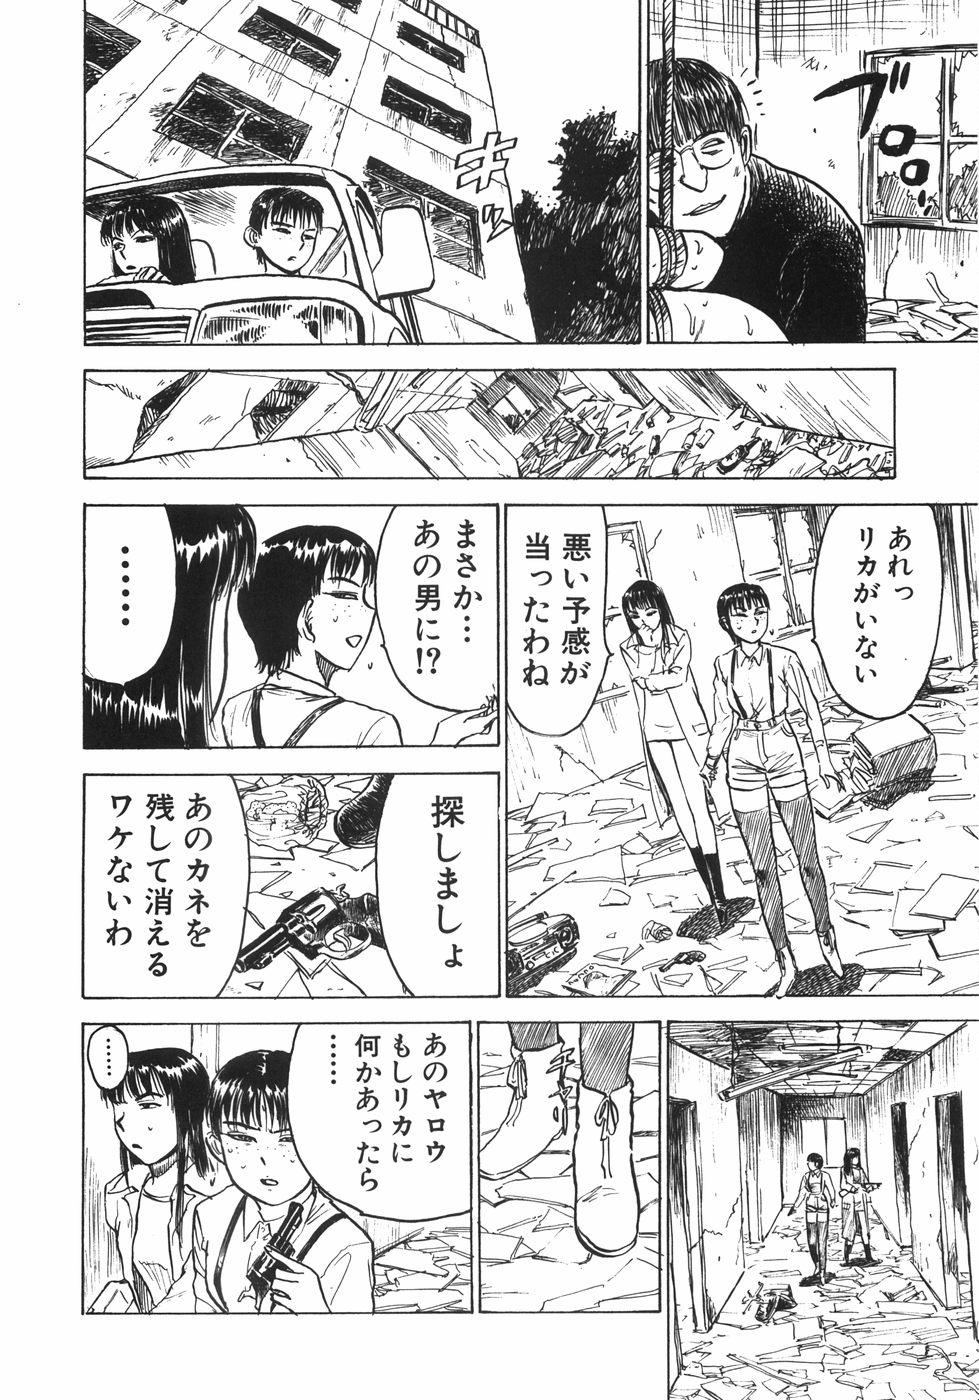 Ningyou no Yakata - The Doll House 124